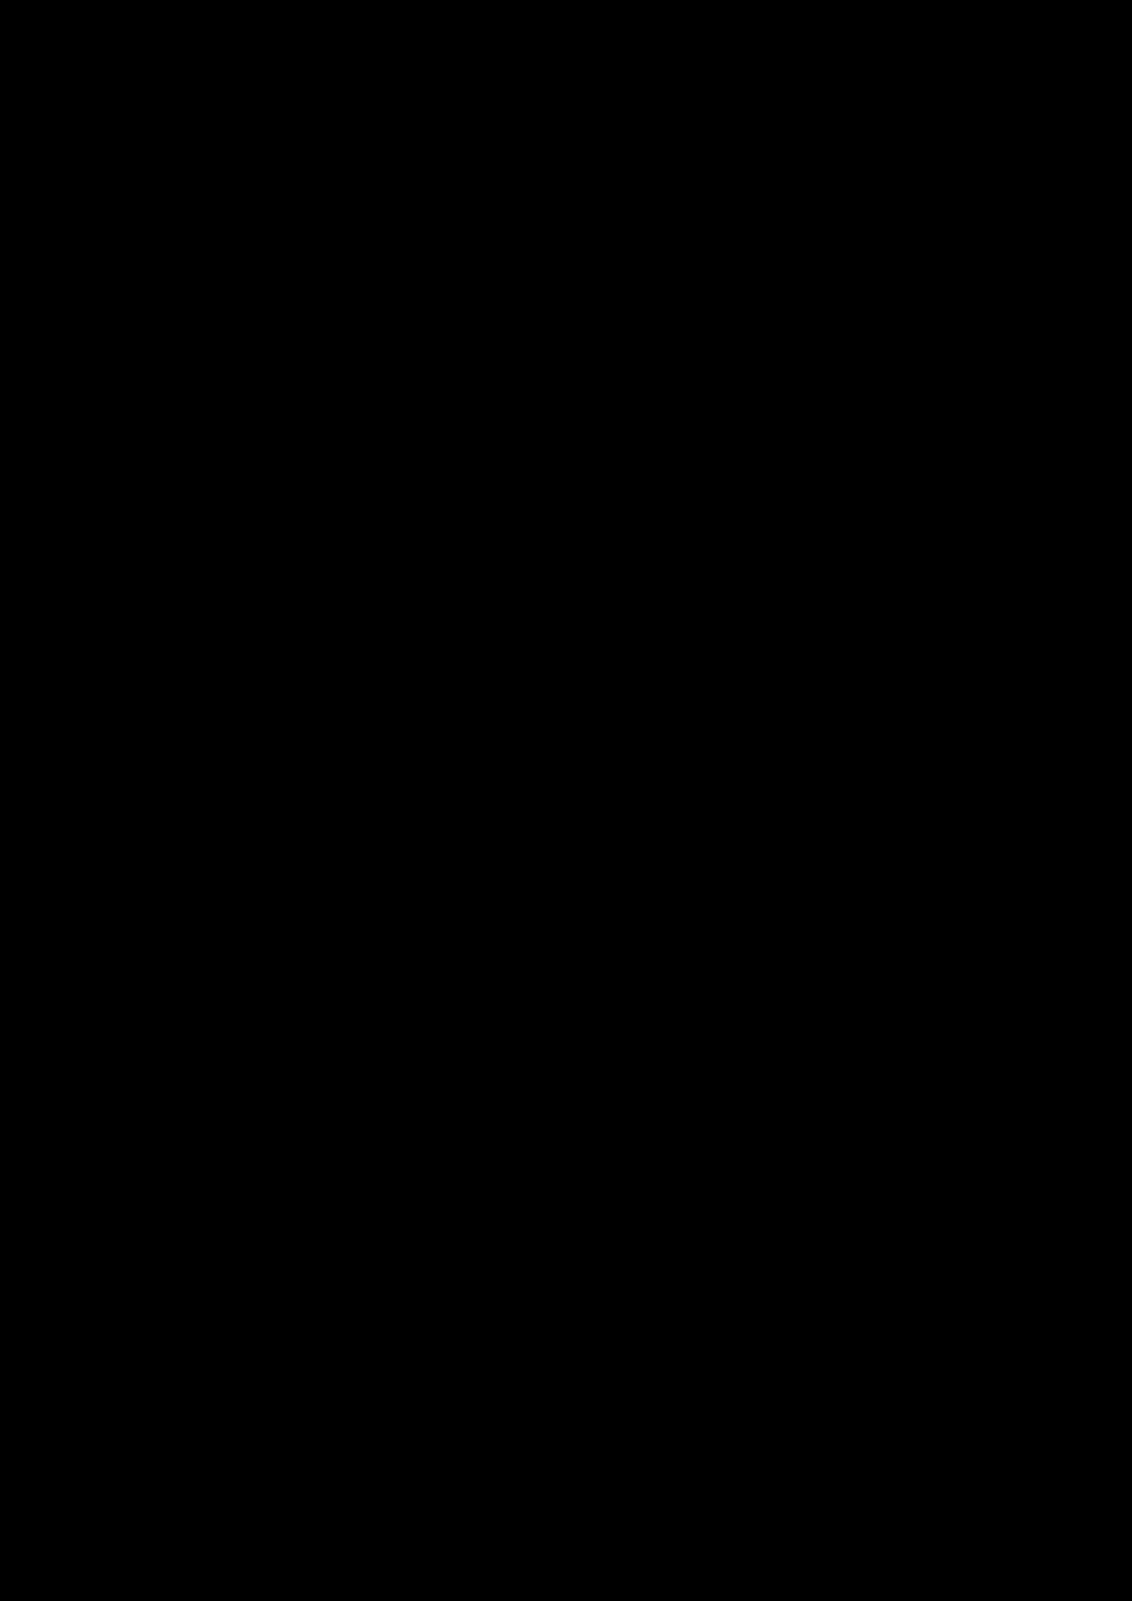 18 berez slide, Image 9